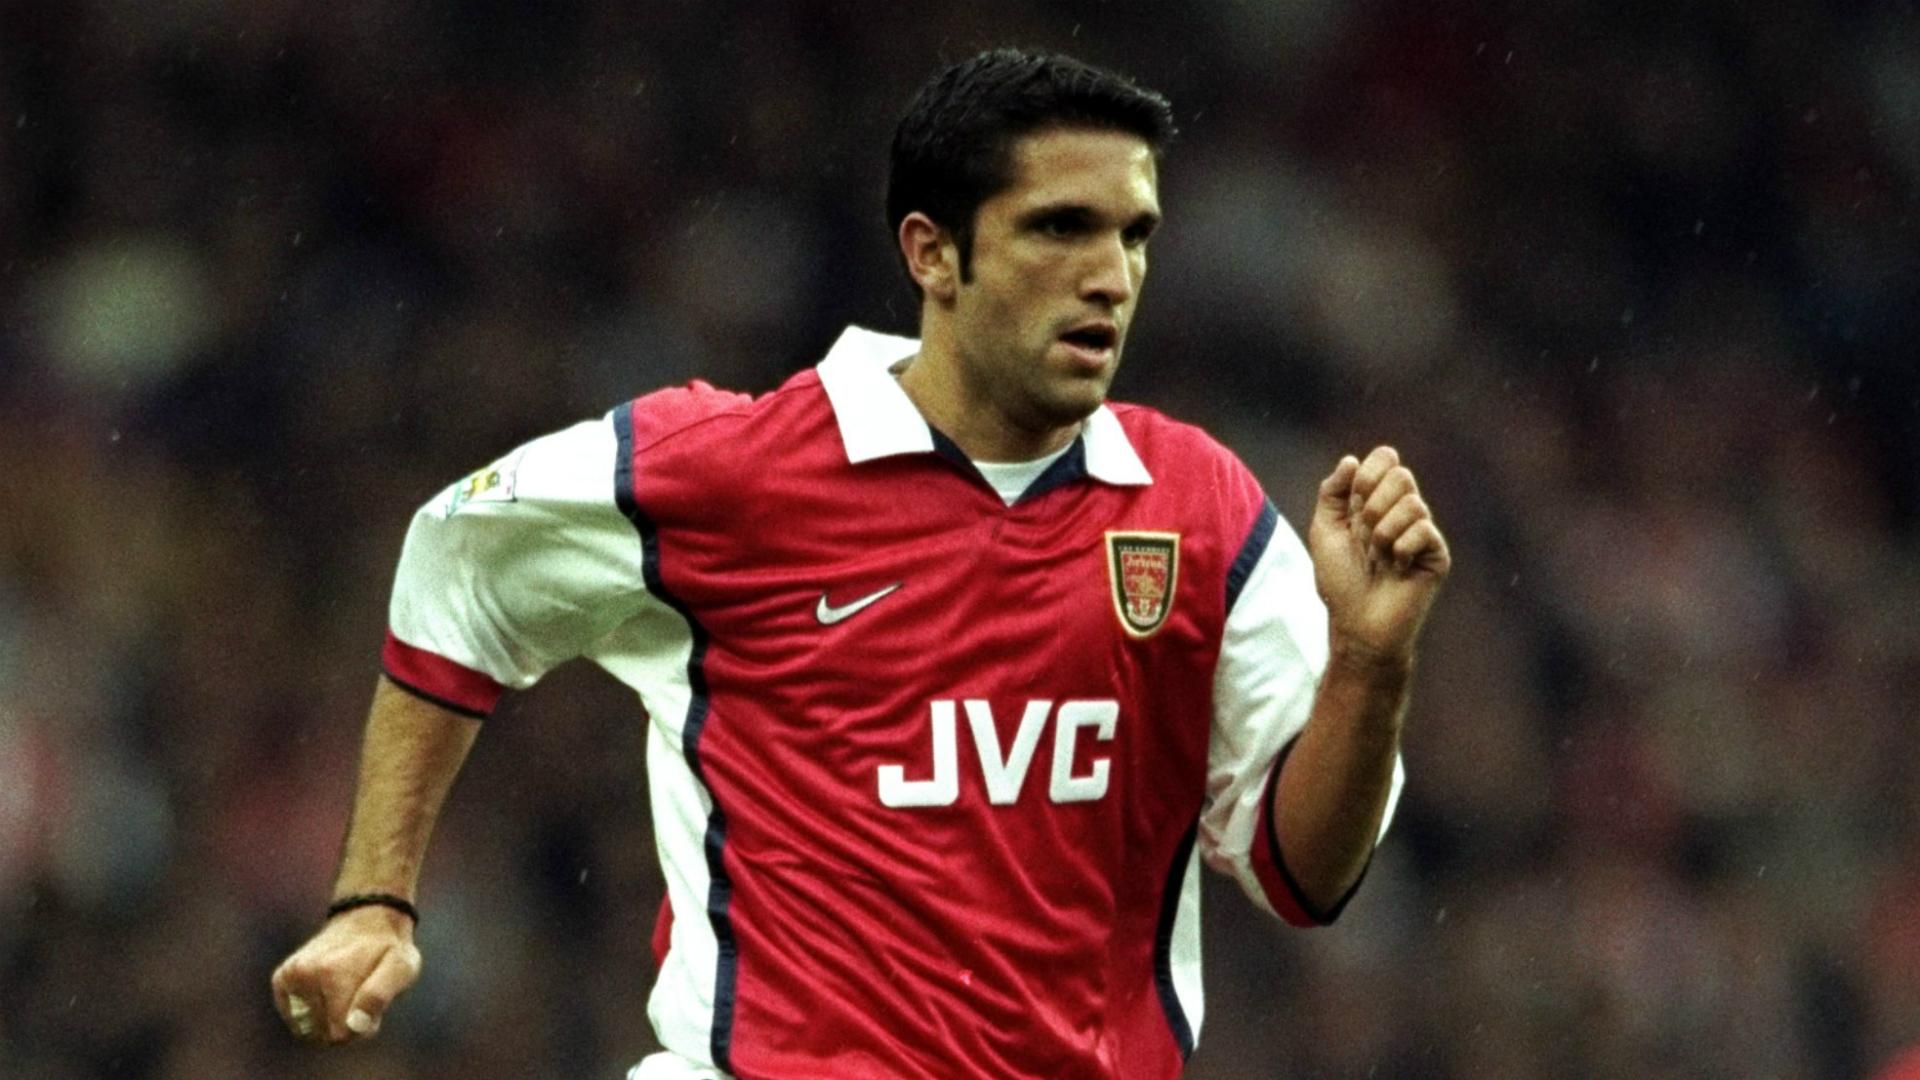 Alberto Mendez, Arsenal